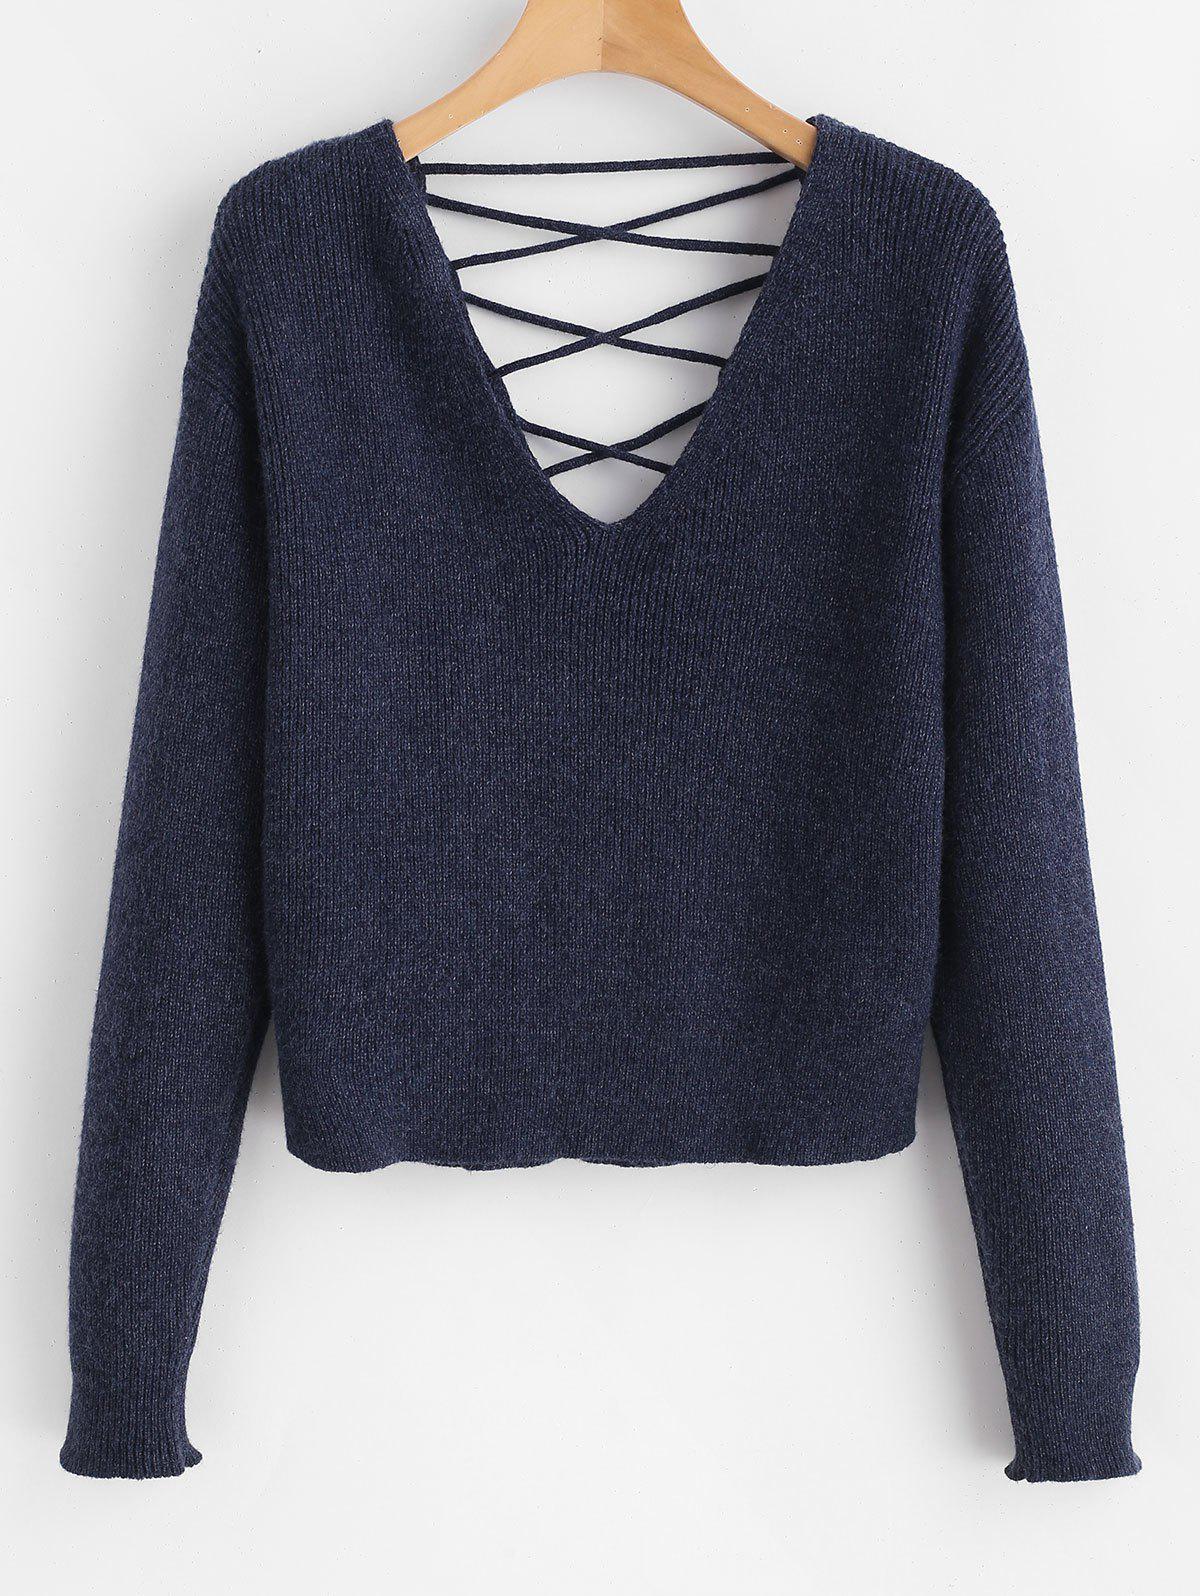 V Back Lace Up Sweater